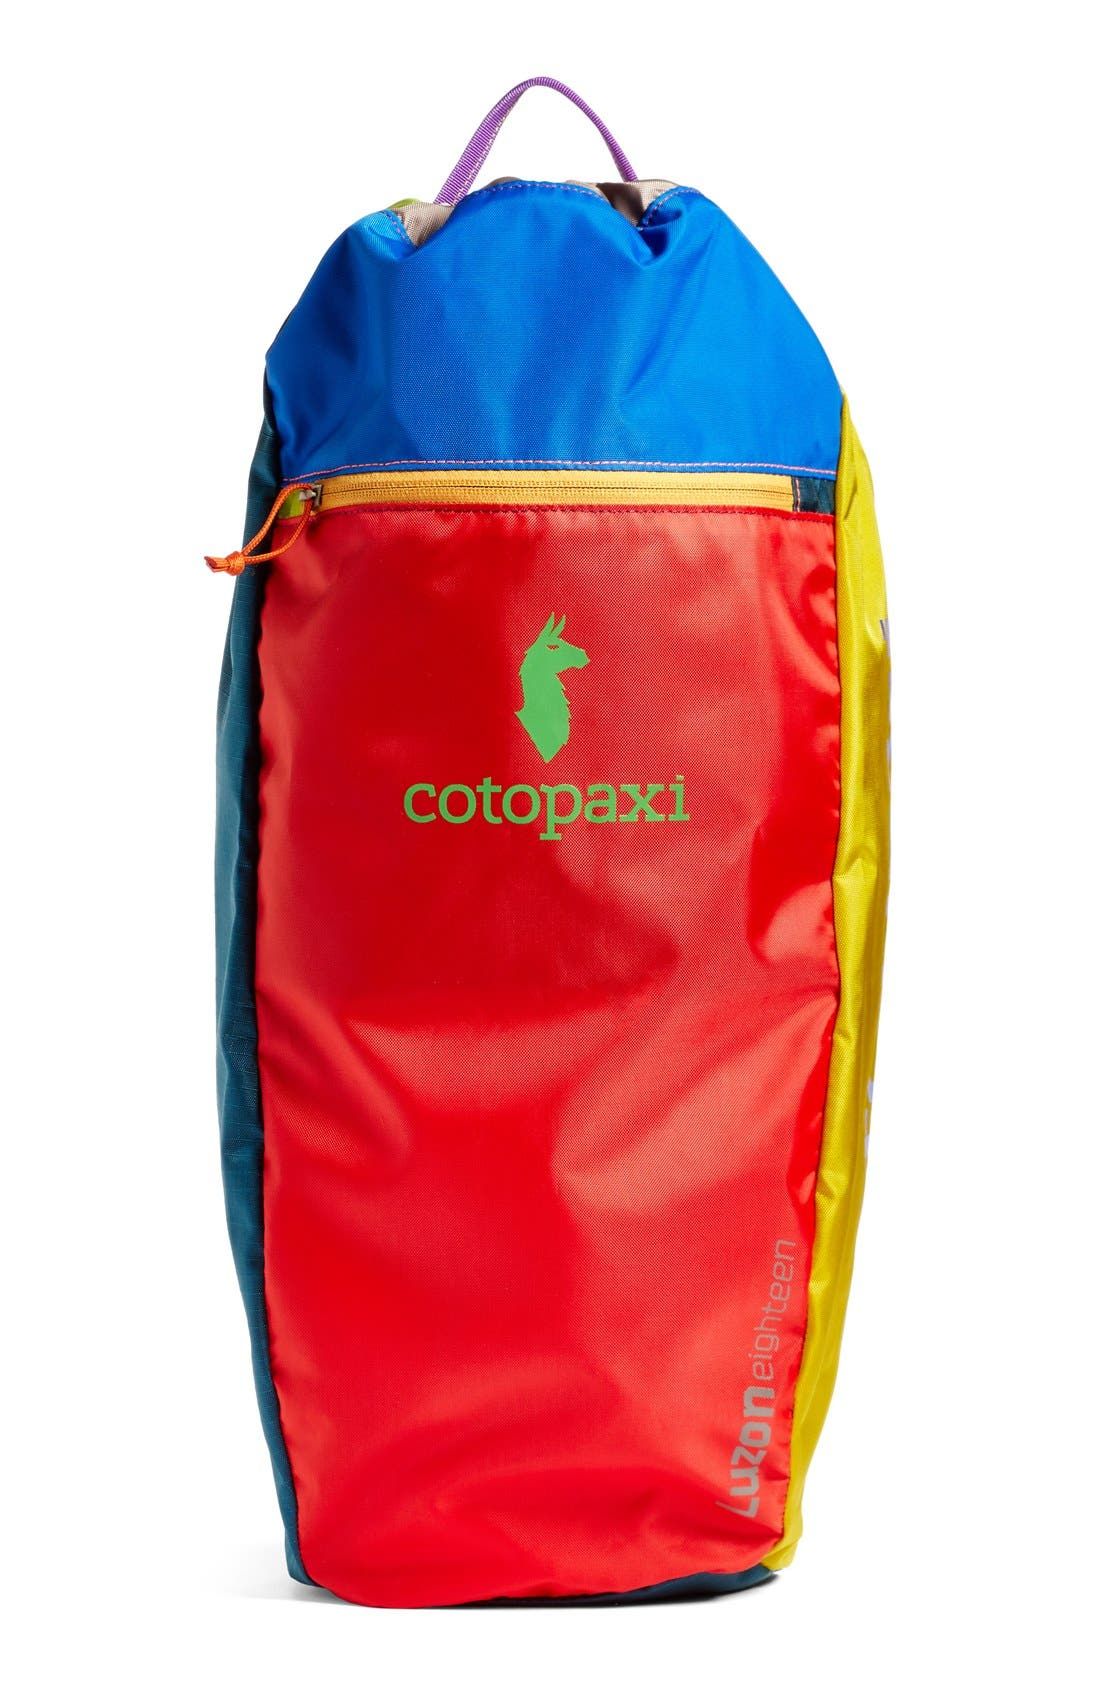 Luzon Del Dia One of a Kind Ripstop Nylon Daypack,                         Main,                         color, 960